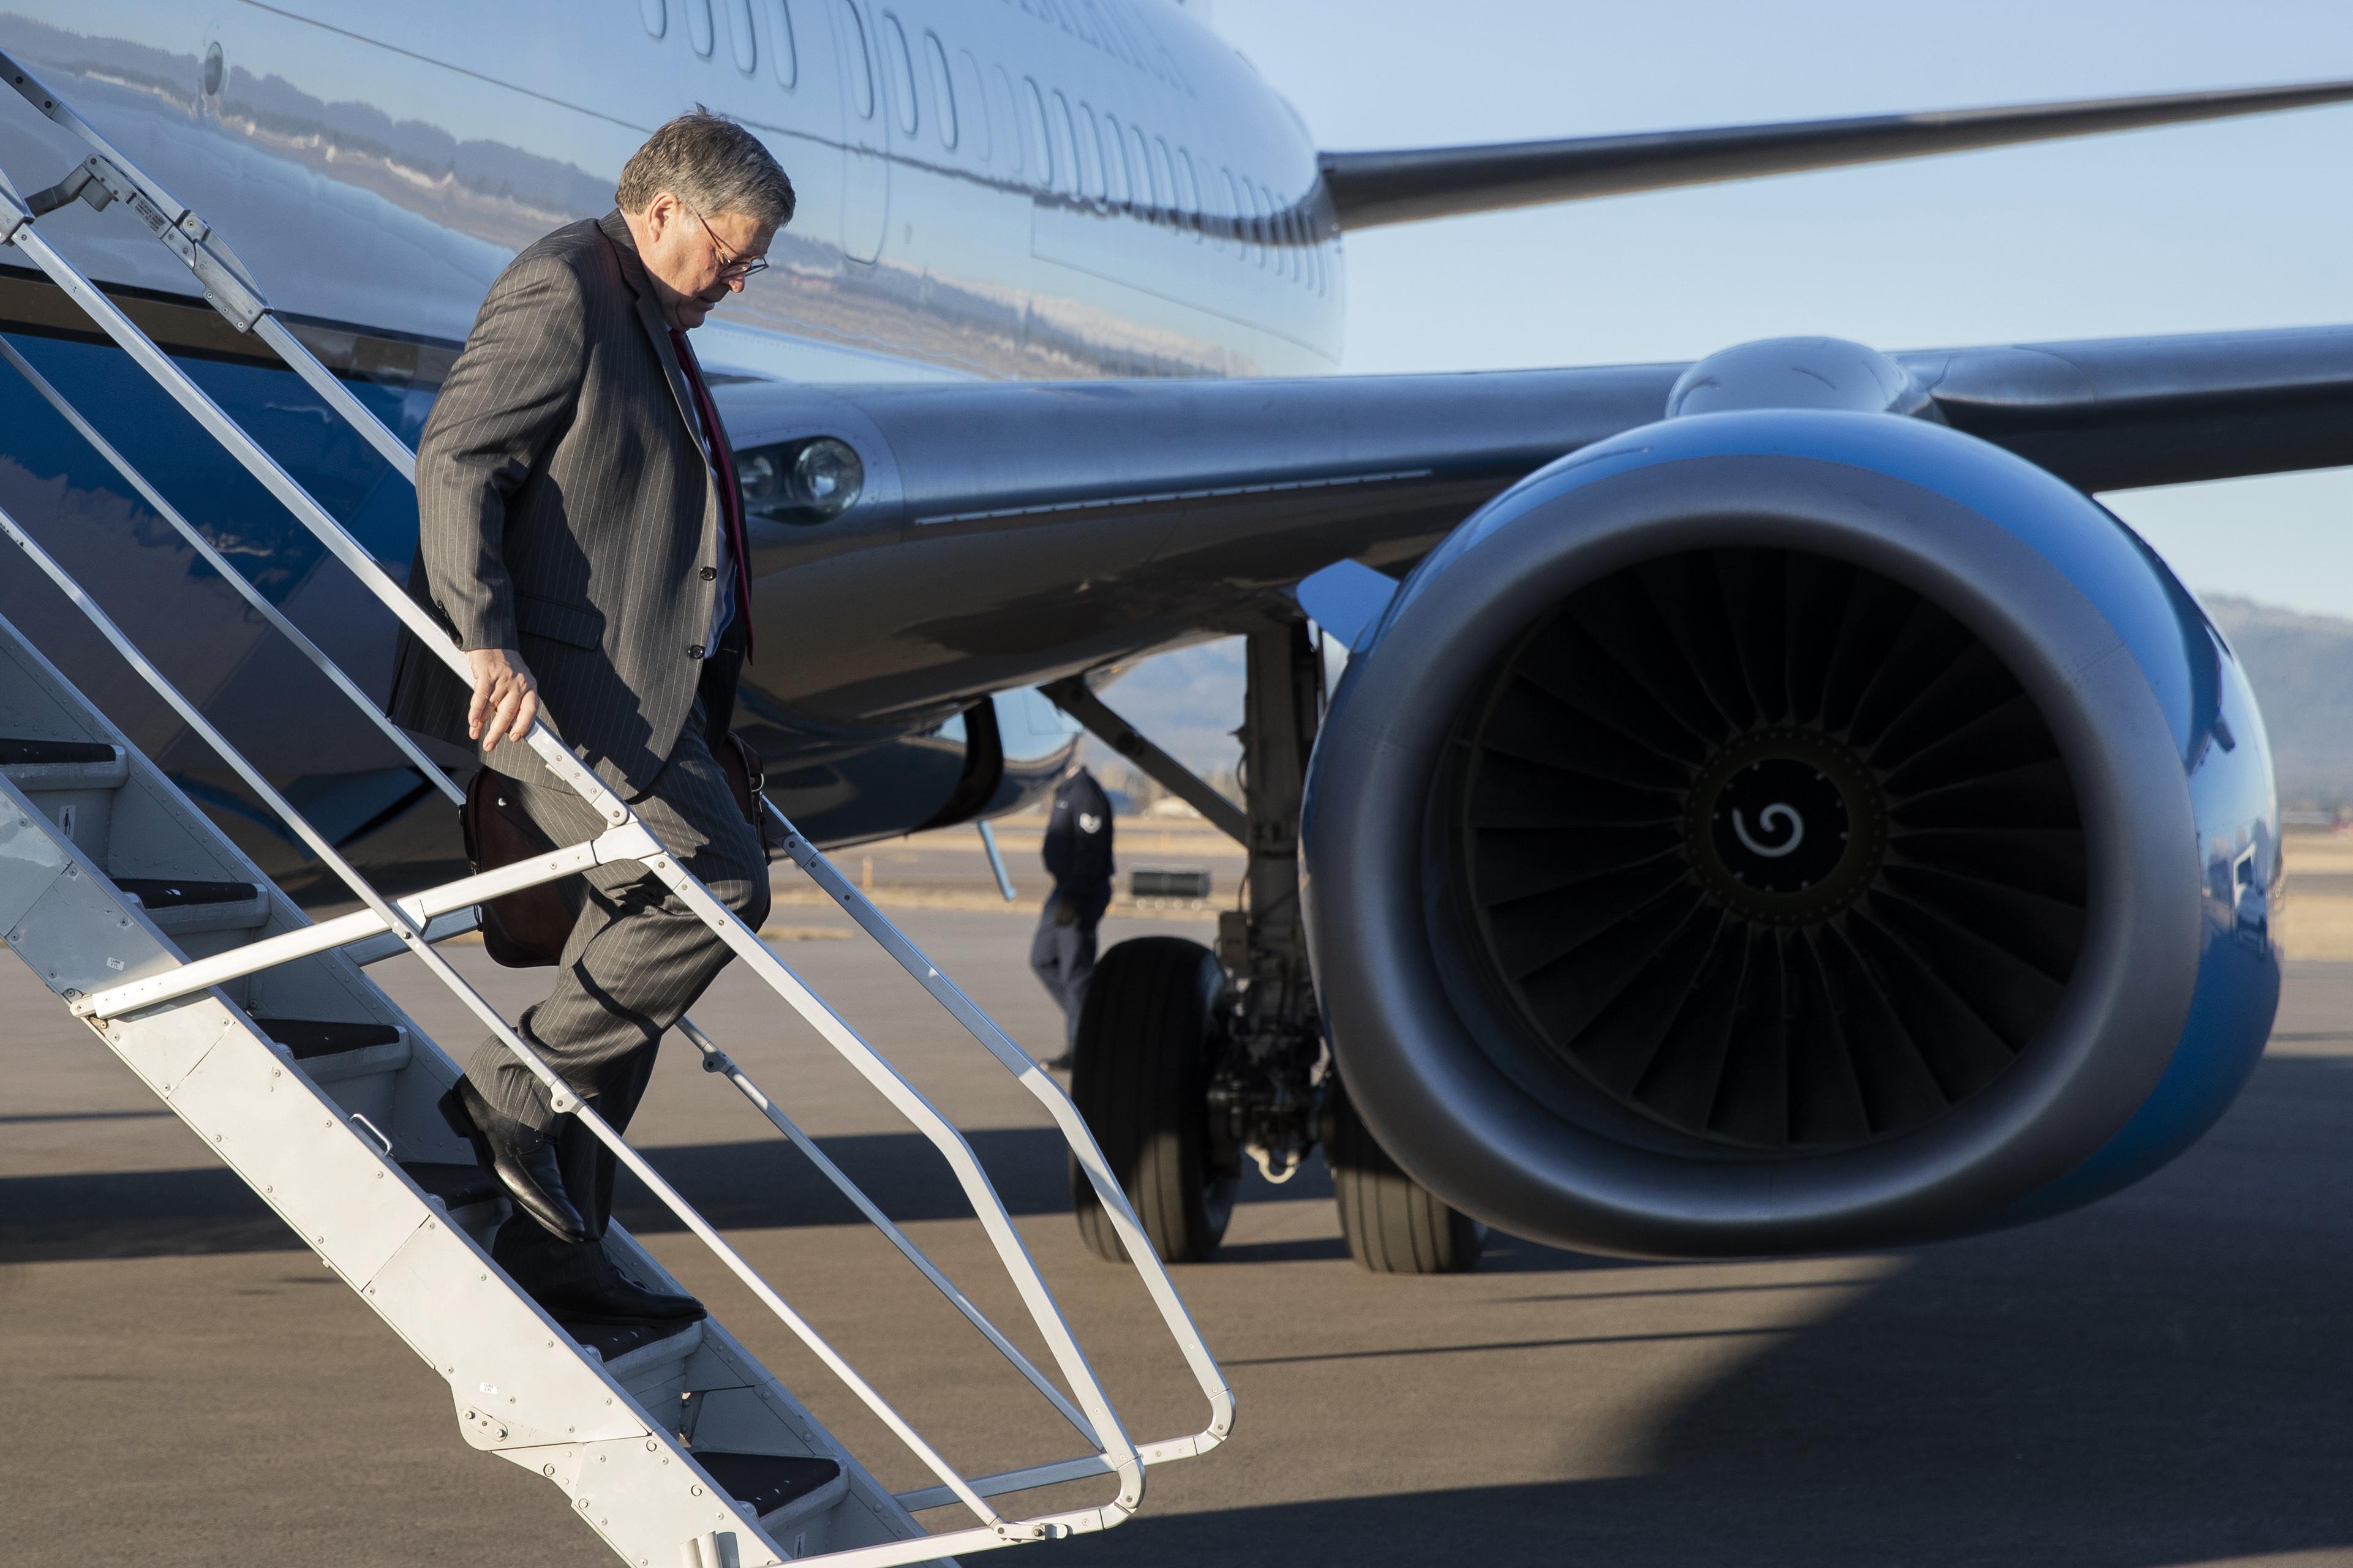 Attorney General William Barr steps off an aircraft at Glacier Park International Airport, Thursday, Nov. 21, 2019, in Kalispell, Mont.